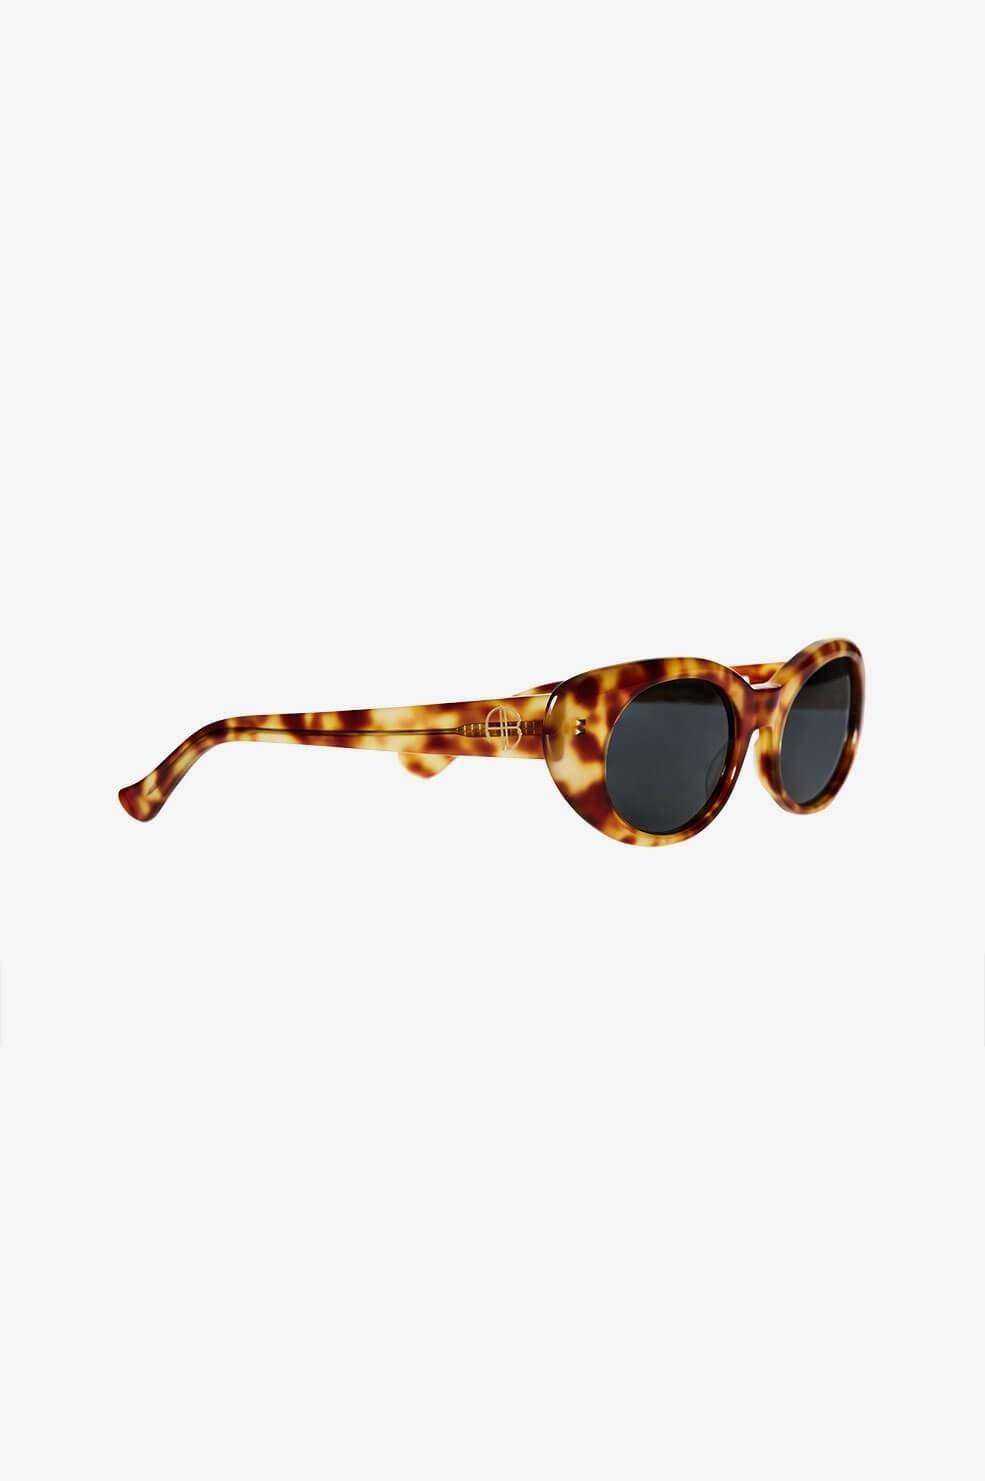 Anine Bing Ojai sunglasses